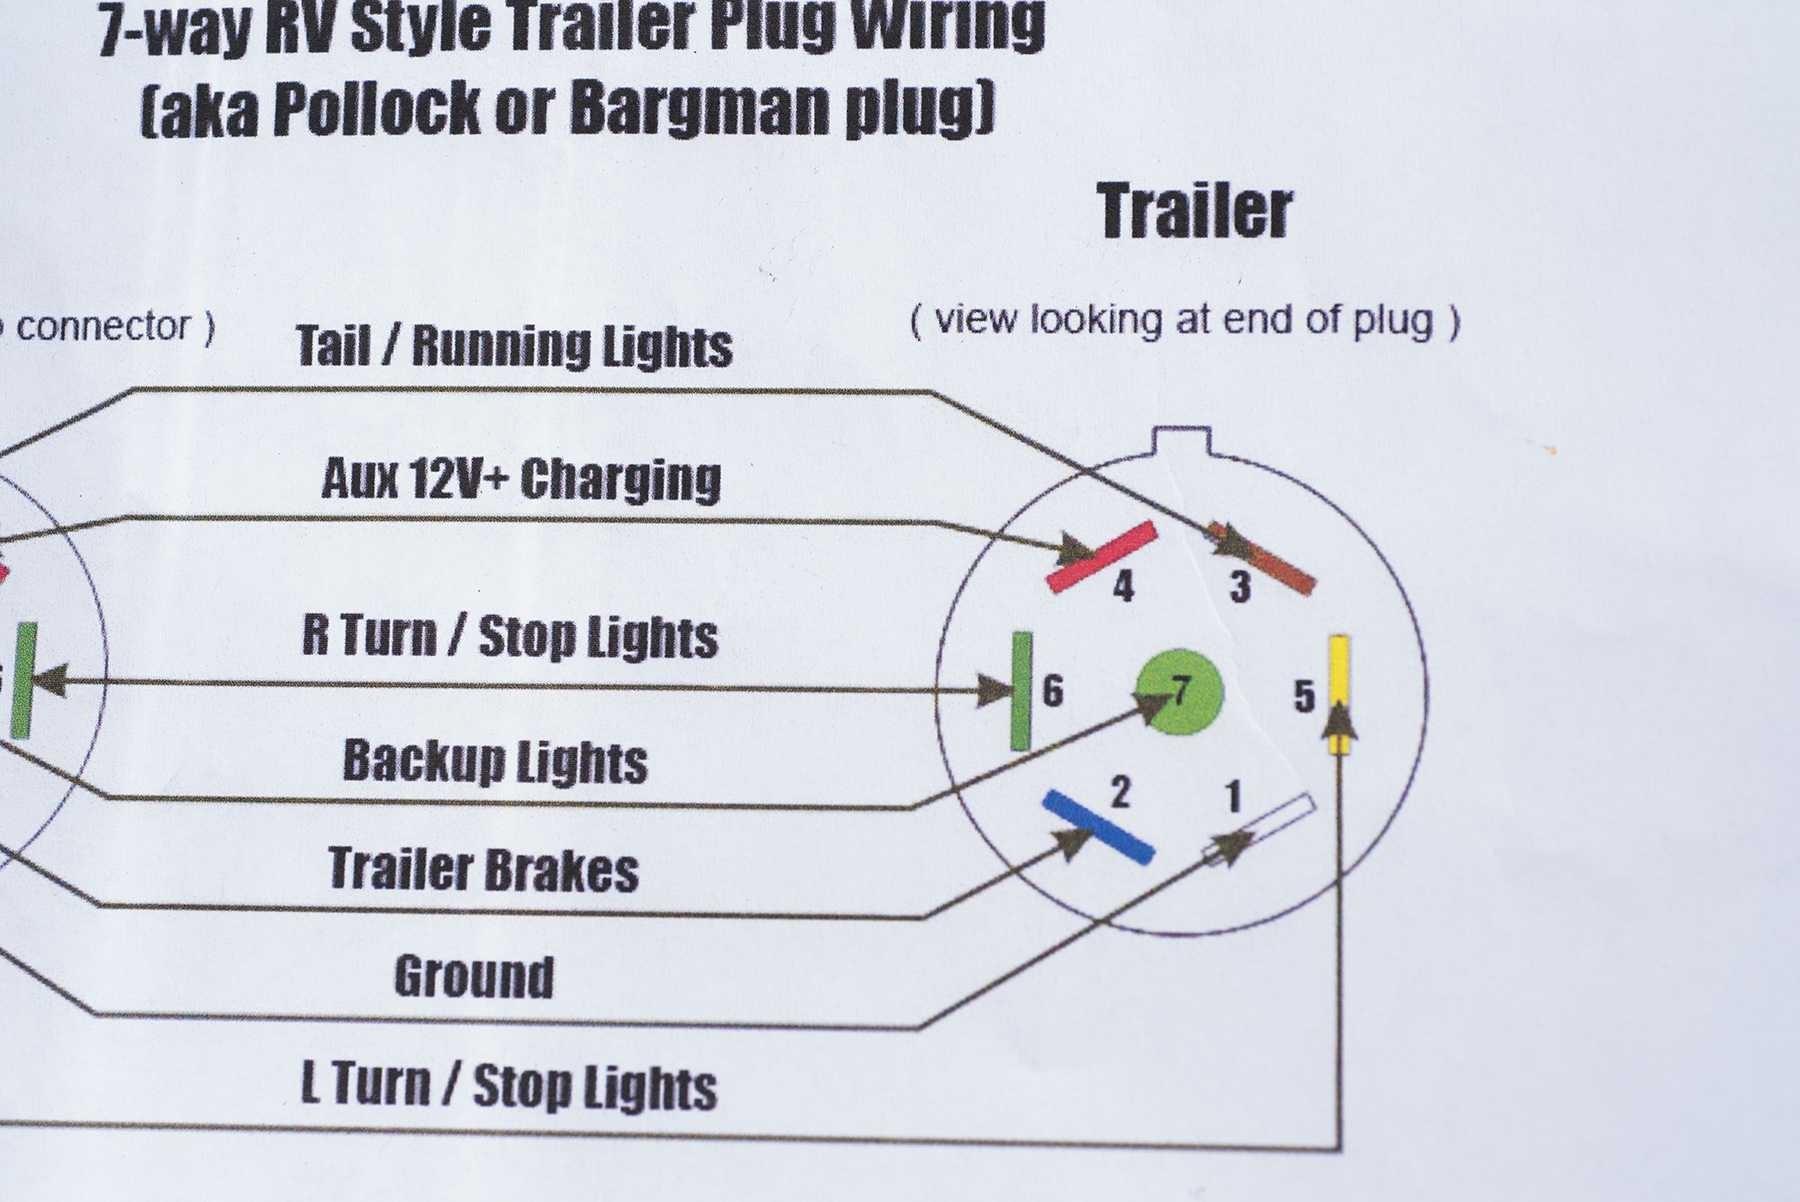 Wiring Diagram Pollak 1923 | Wiring Diagram - Pollak Trailer Plug Wiring Diagram